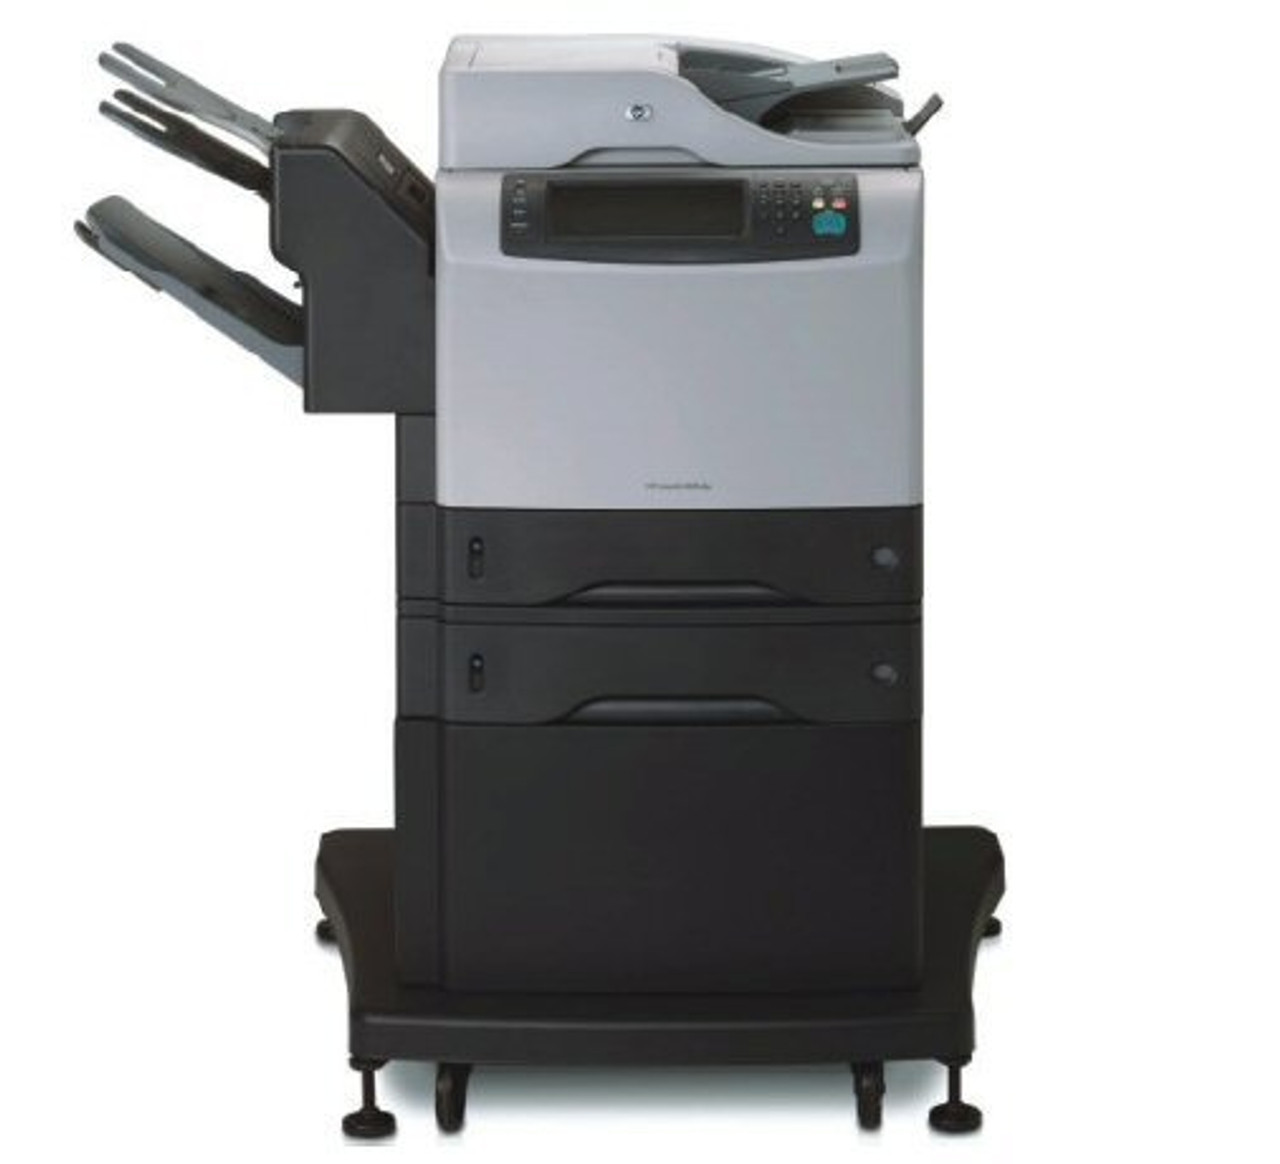 HP LaserJet M4345XM MFP - CB428A - HP Laser Printer for sale